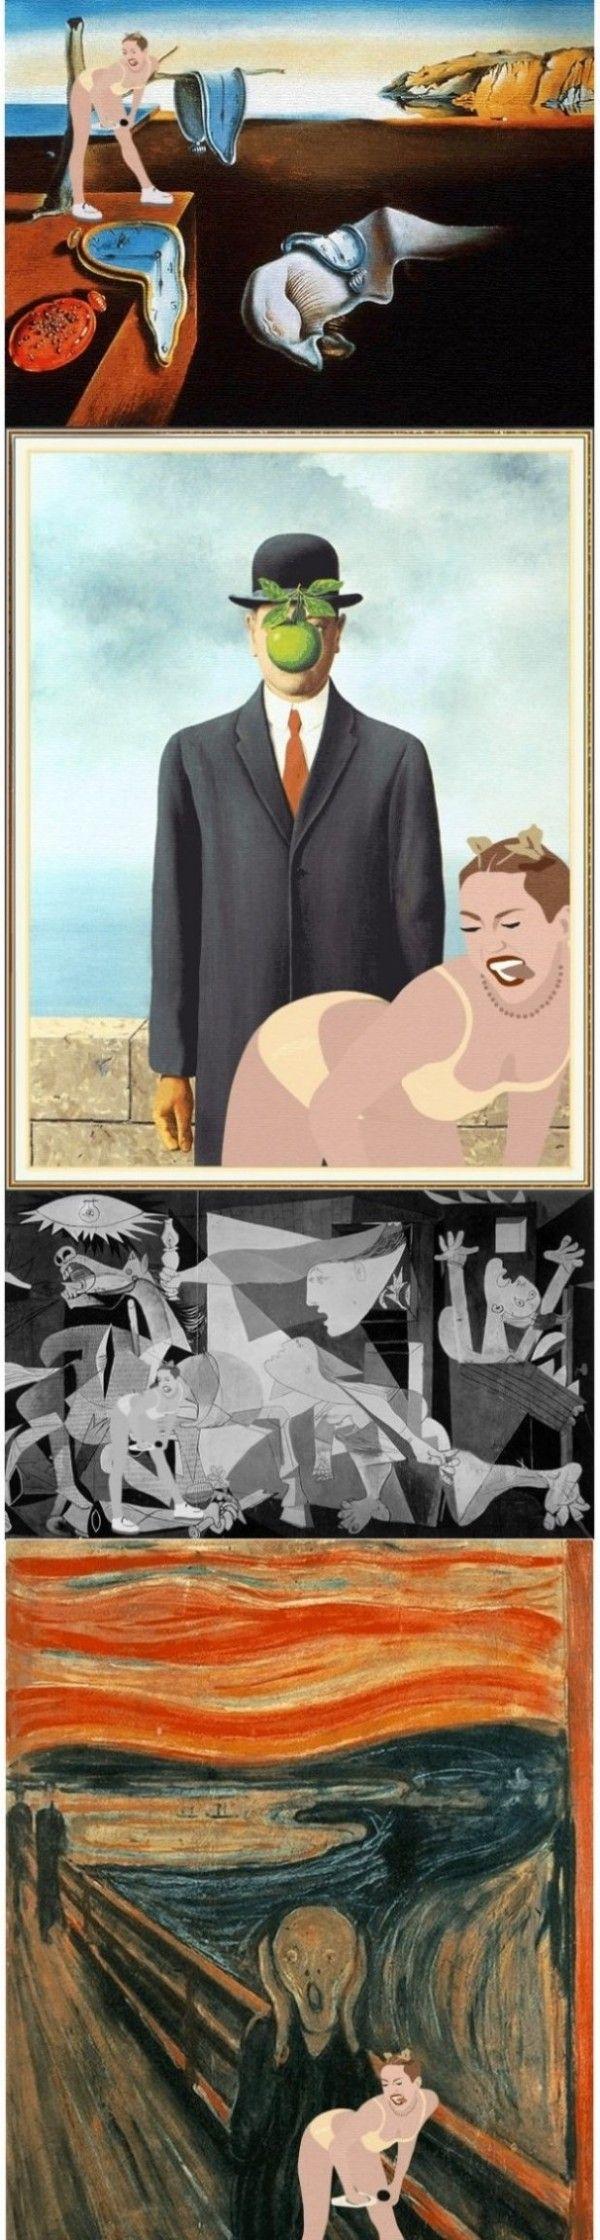 Twerks Of Art - www.meme-lol.com